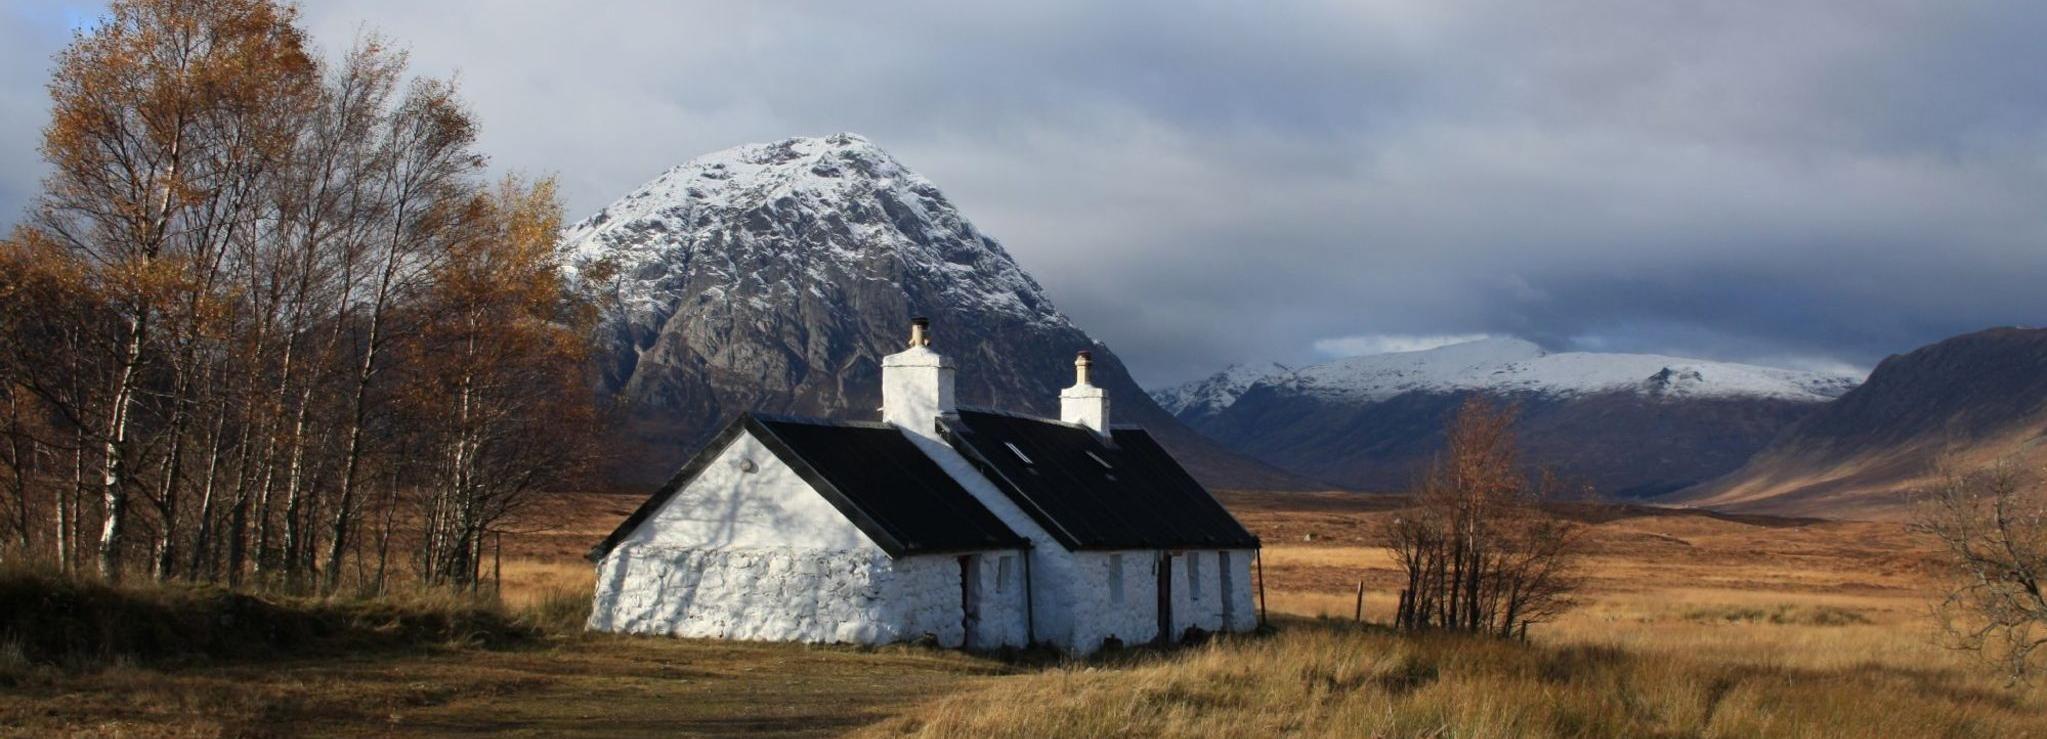 From Glasgow: Oban, Glencoe, Highland Lochs & Castles Tour